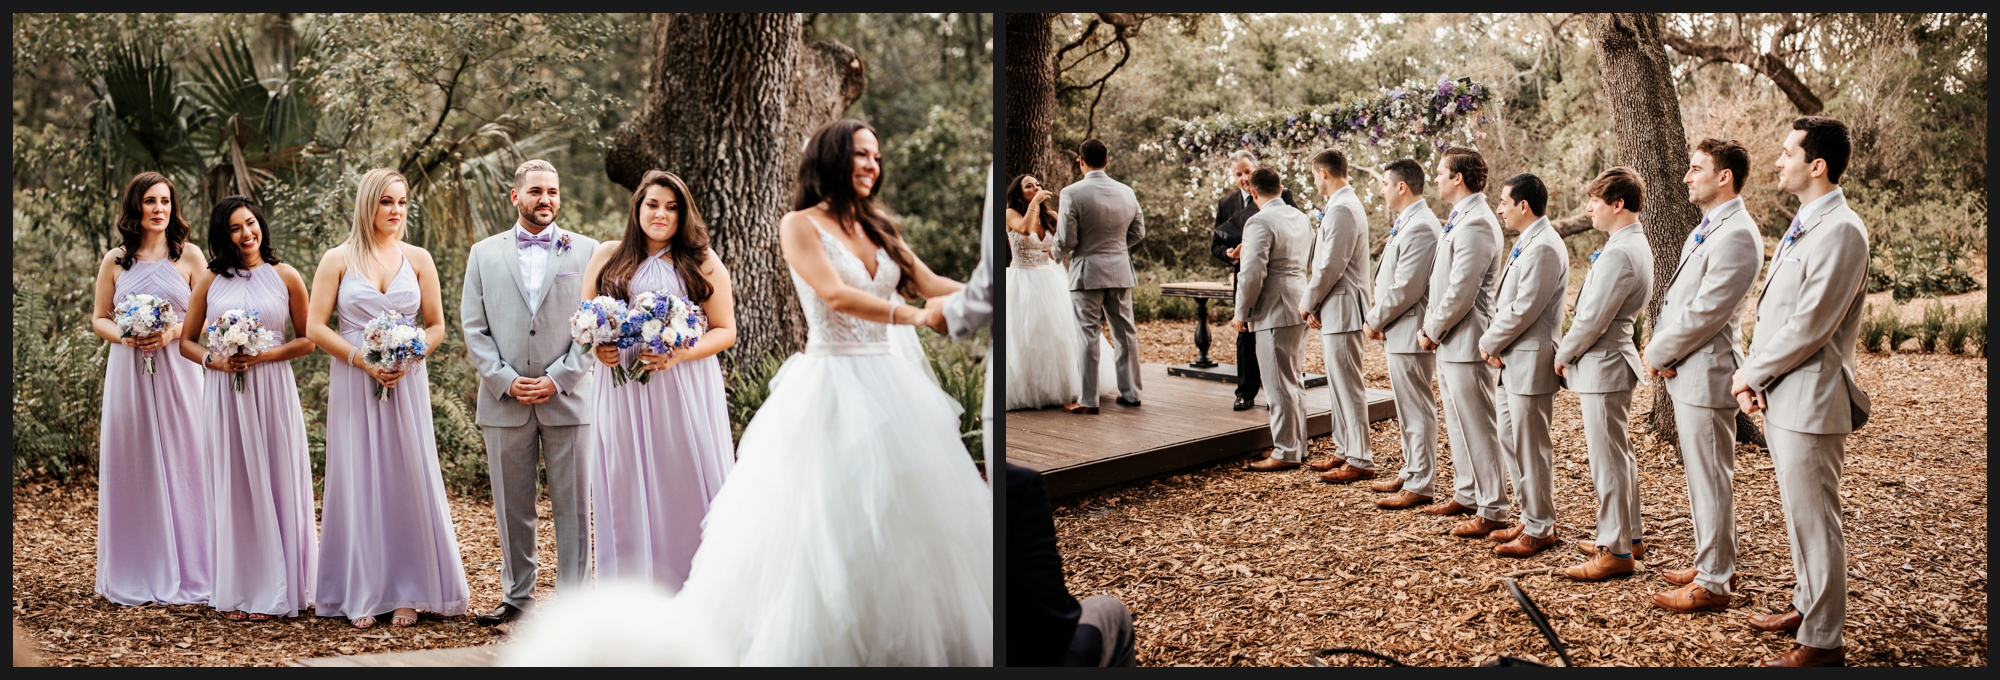 Orlando-Wedding-Photographer-destination-wedding-photographer-florida-wedding-photographer-bohemian-wedding-photographer_1563.jpg